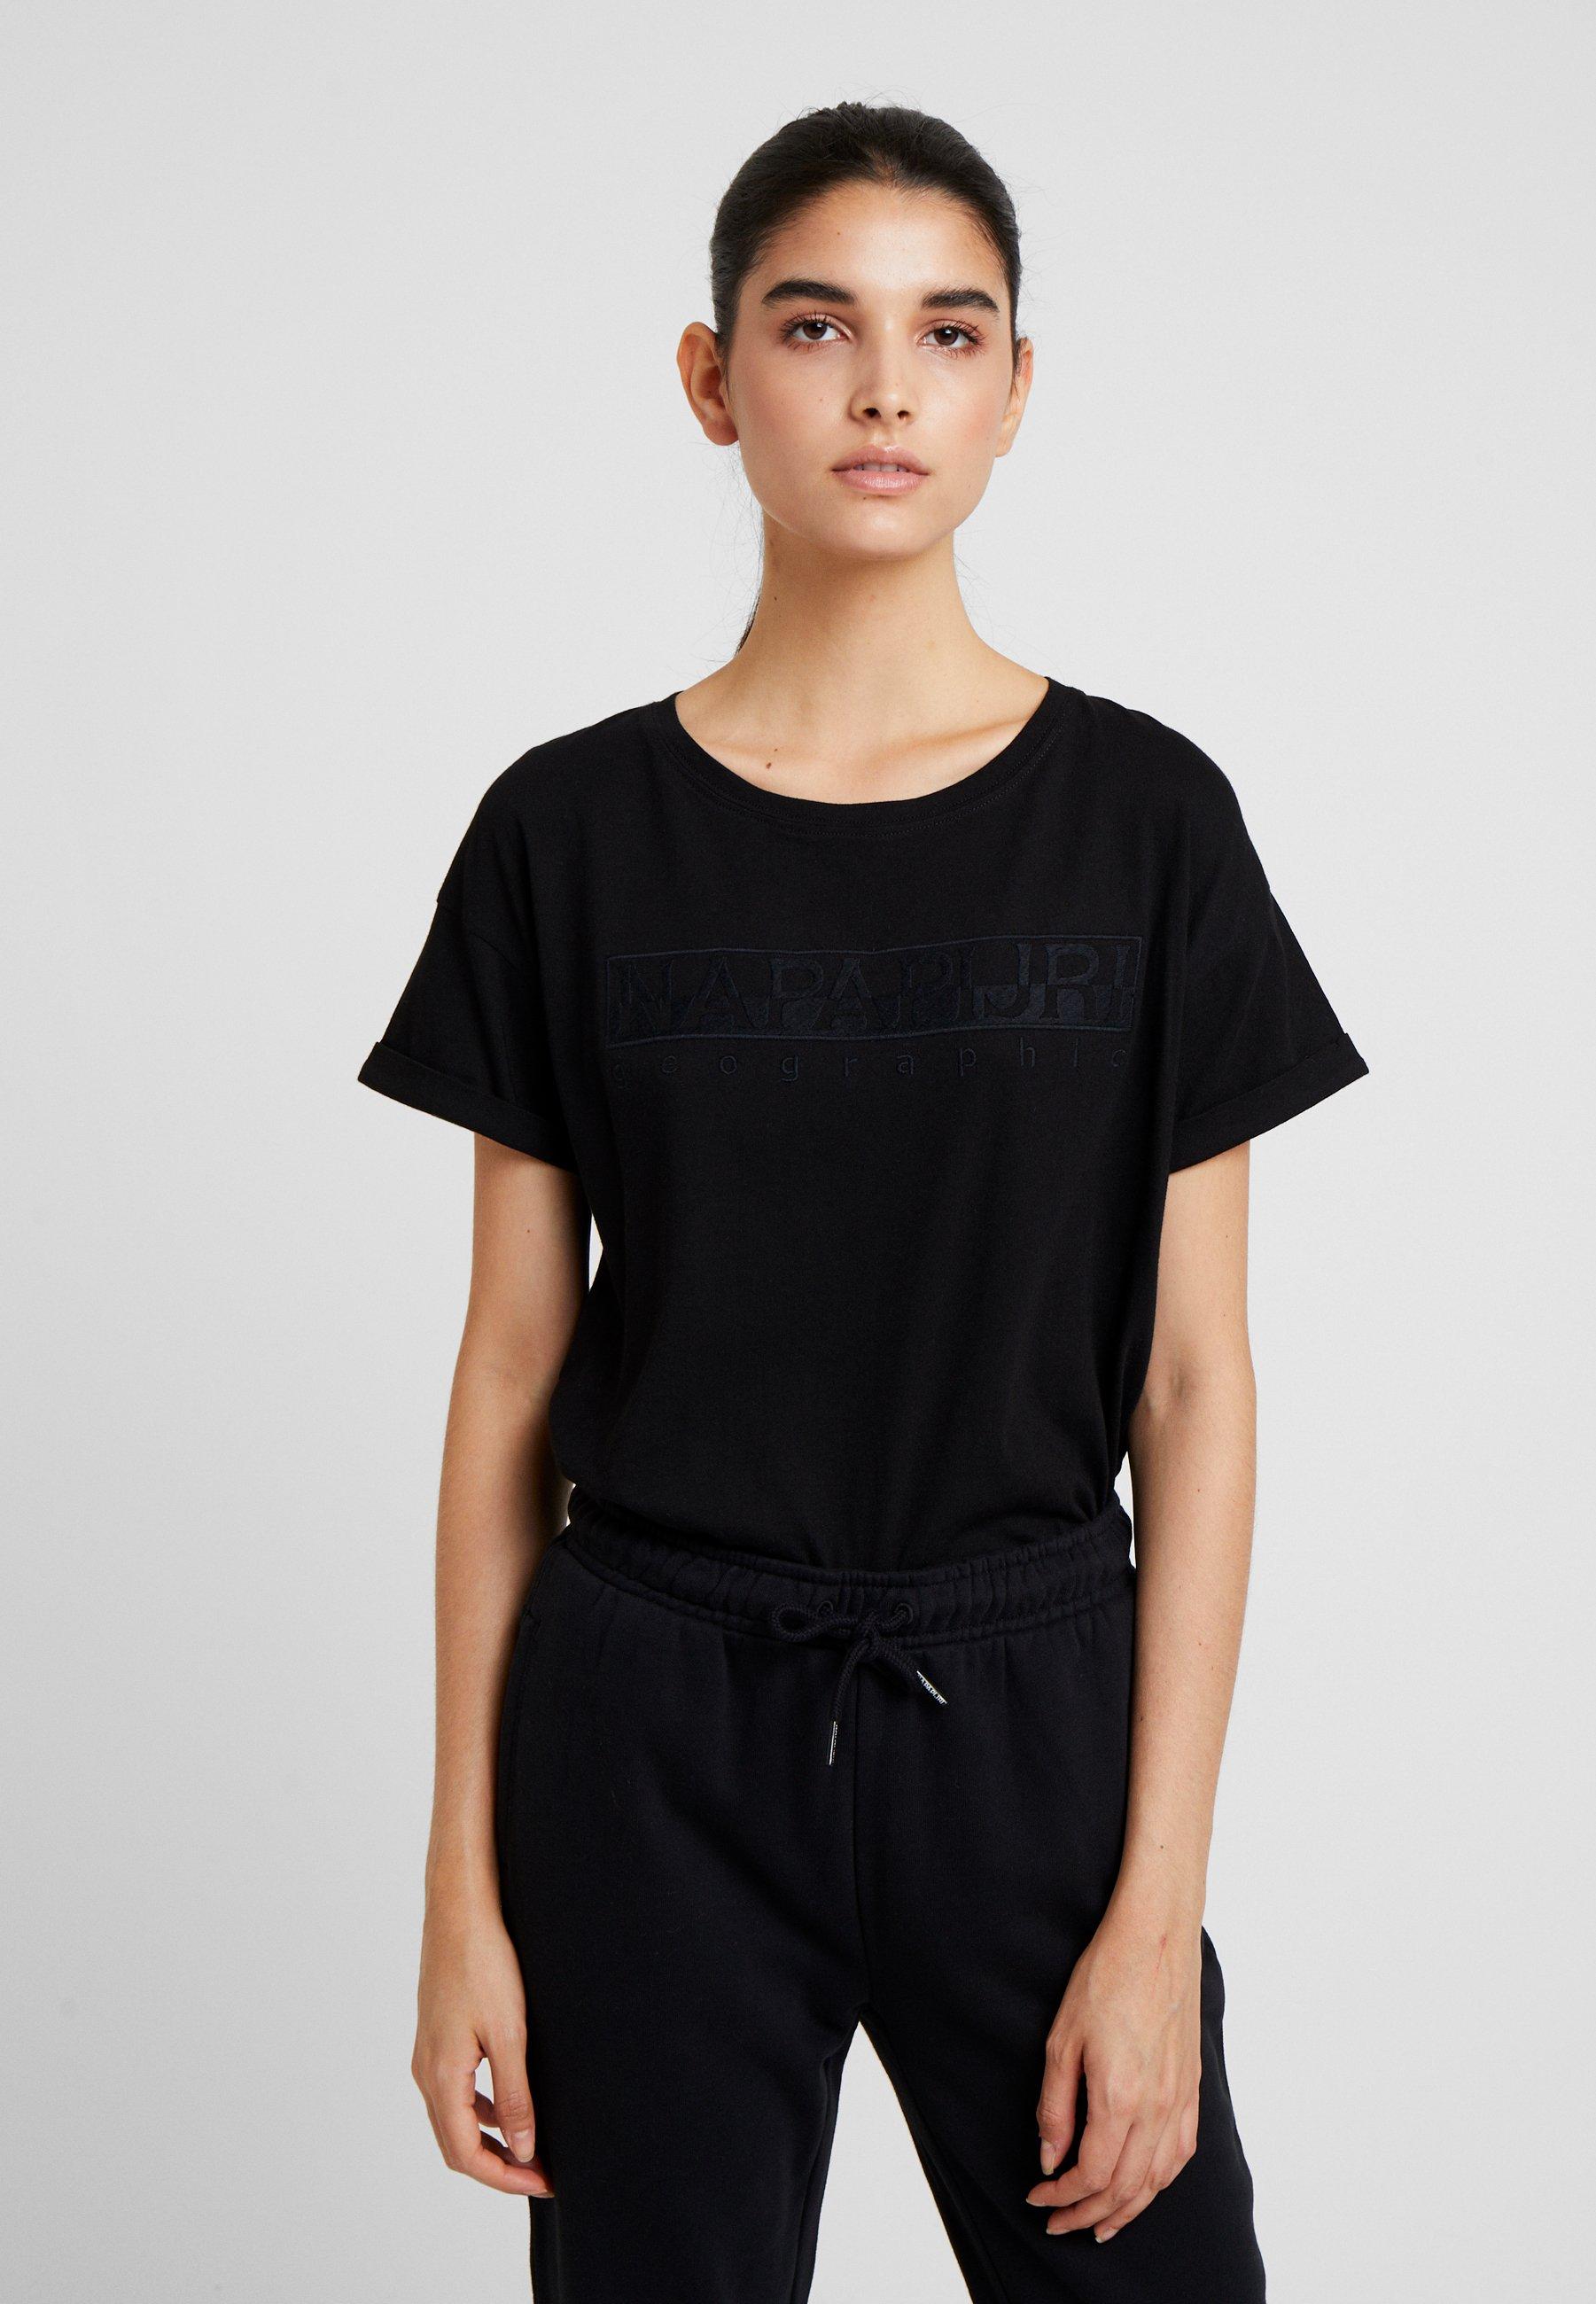 Con Serber shirt Napapijri Stampa WomT Black 35ARj4L